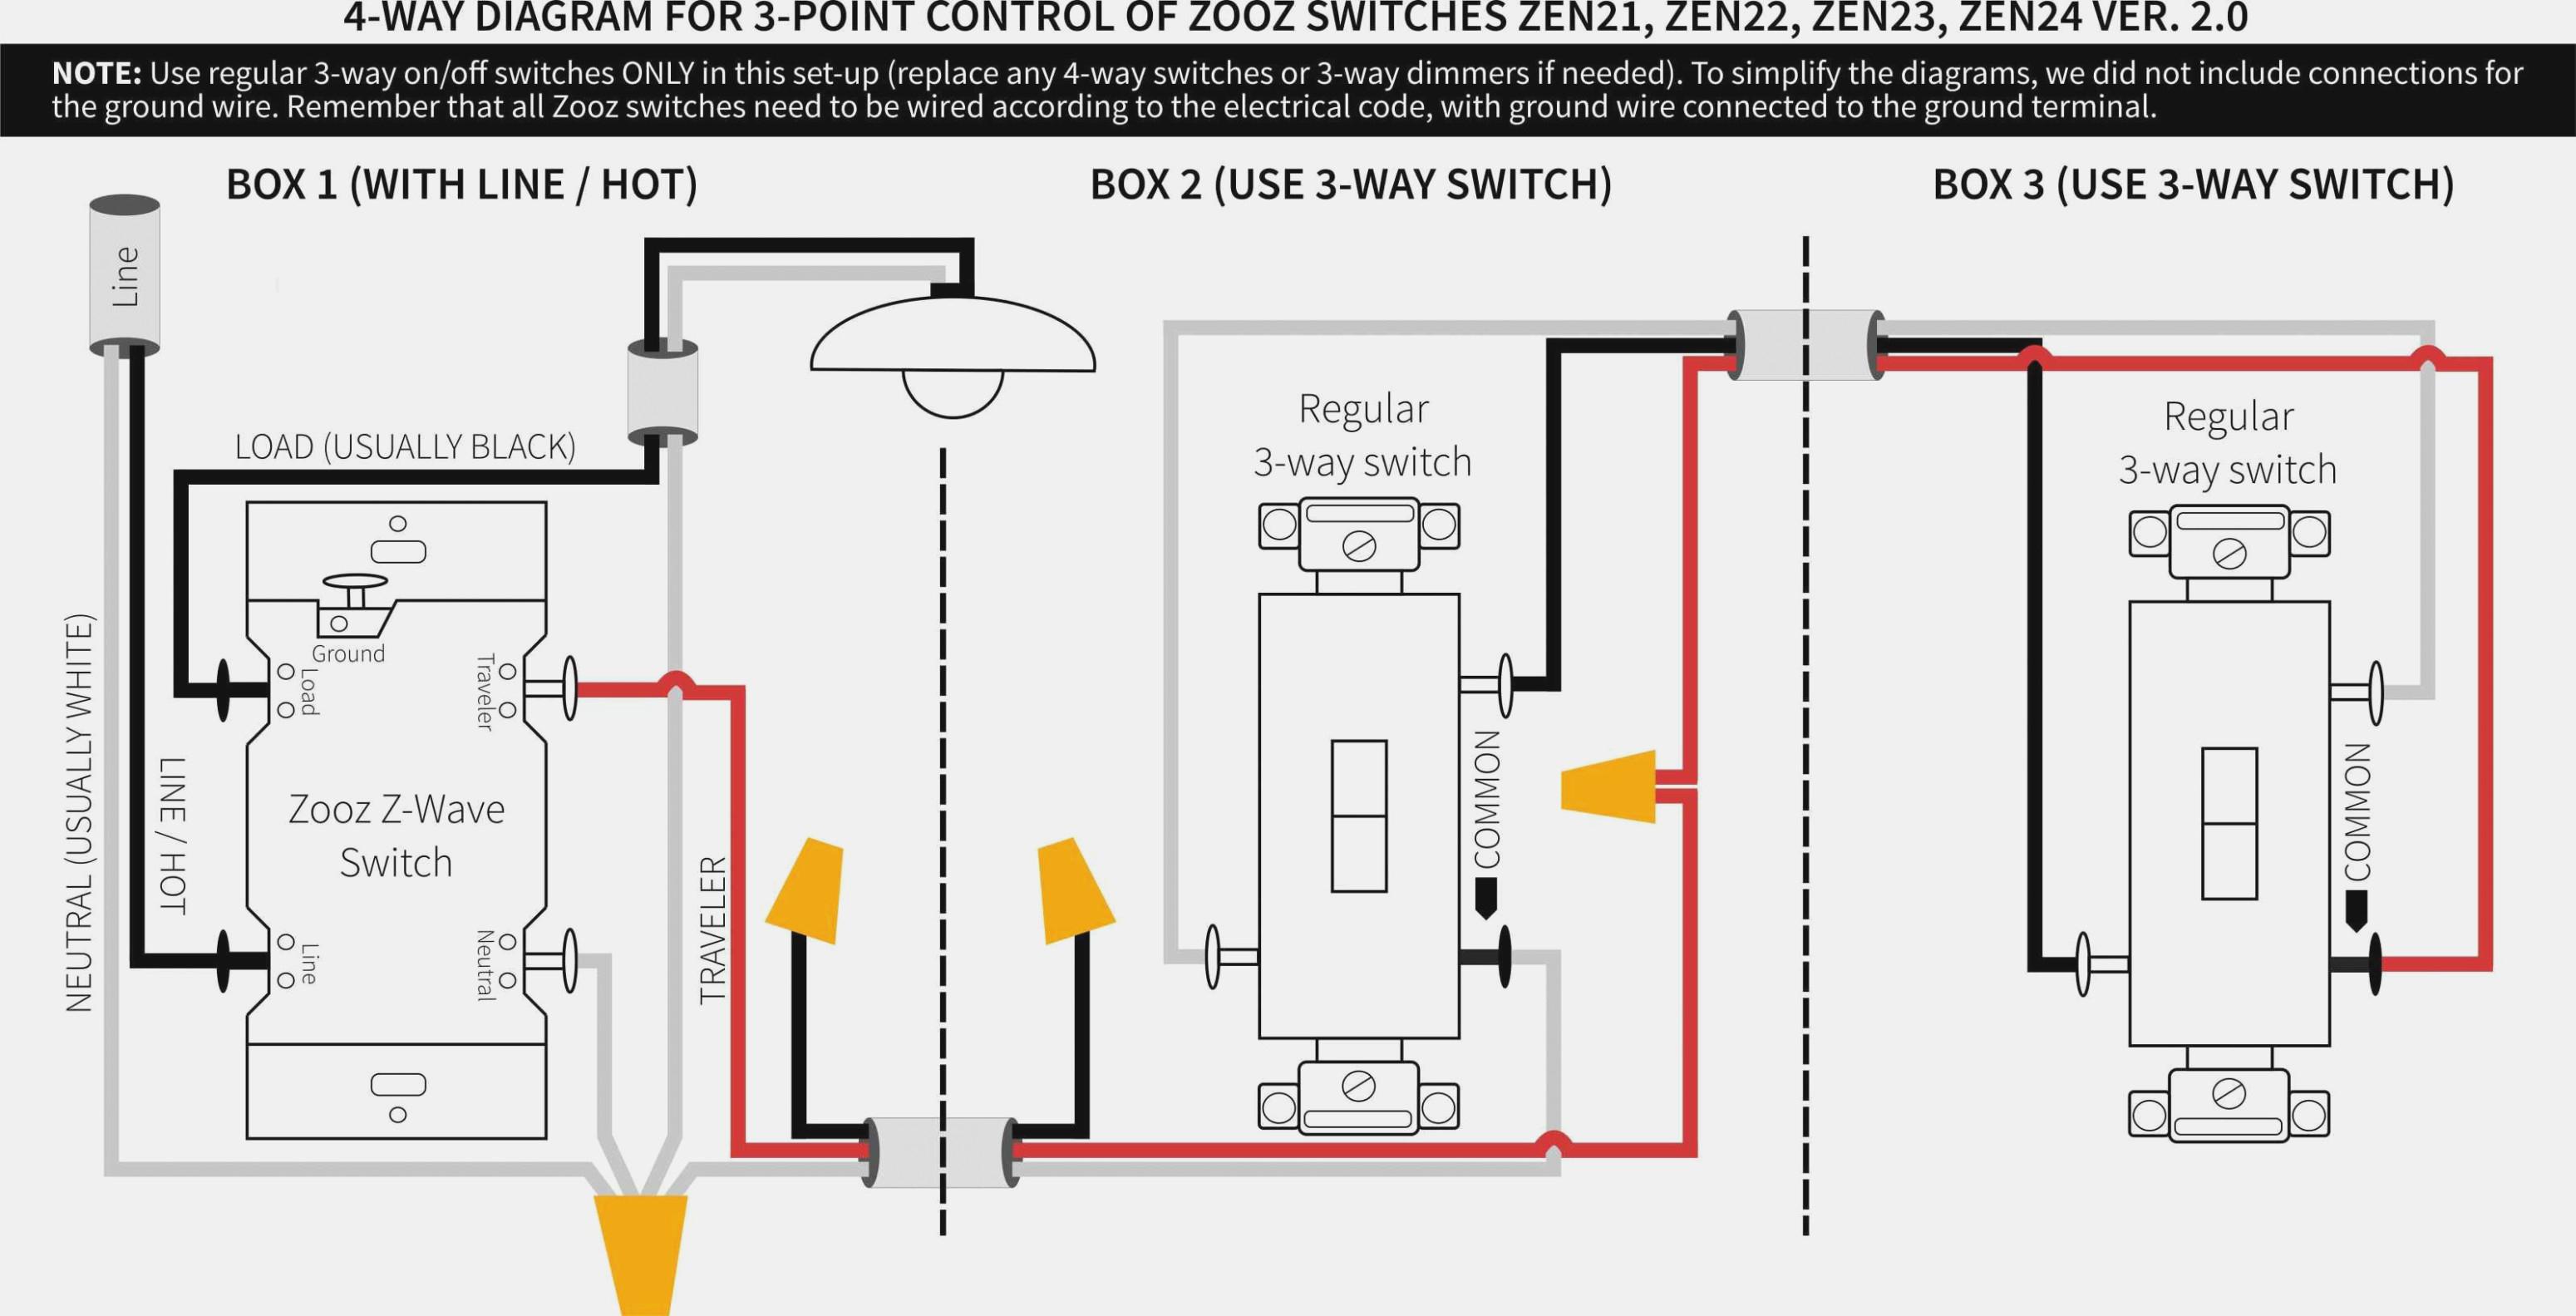 3 Way Wiring Diagram Ge 3 Way Dimmer Switch Wiring Diagram Wiring Diagram Article